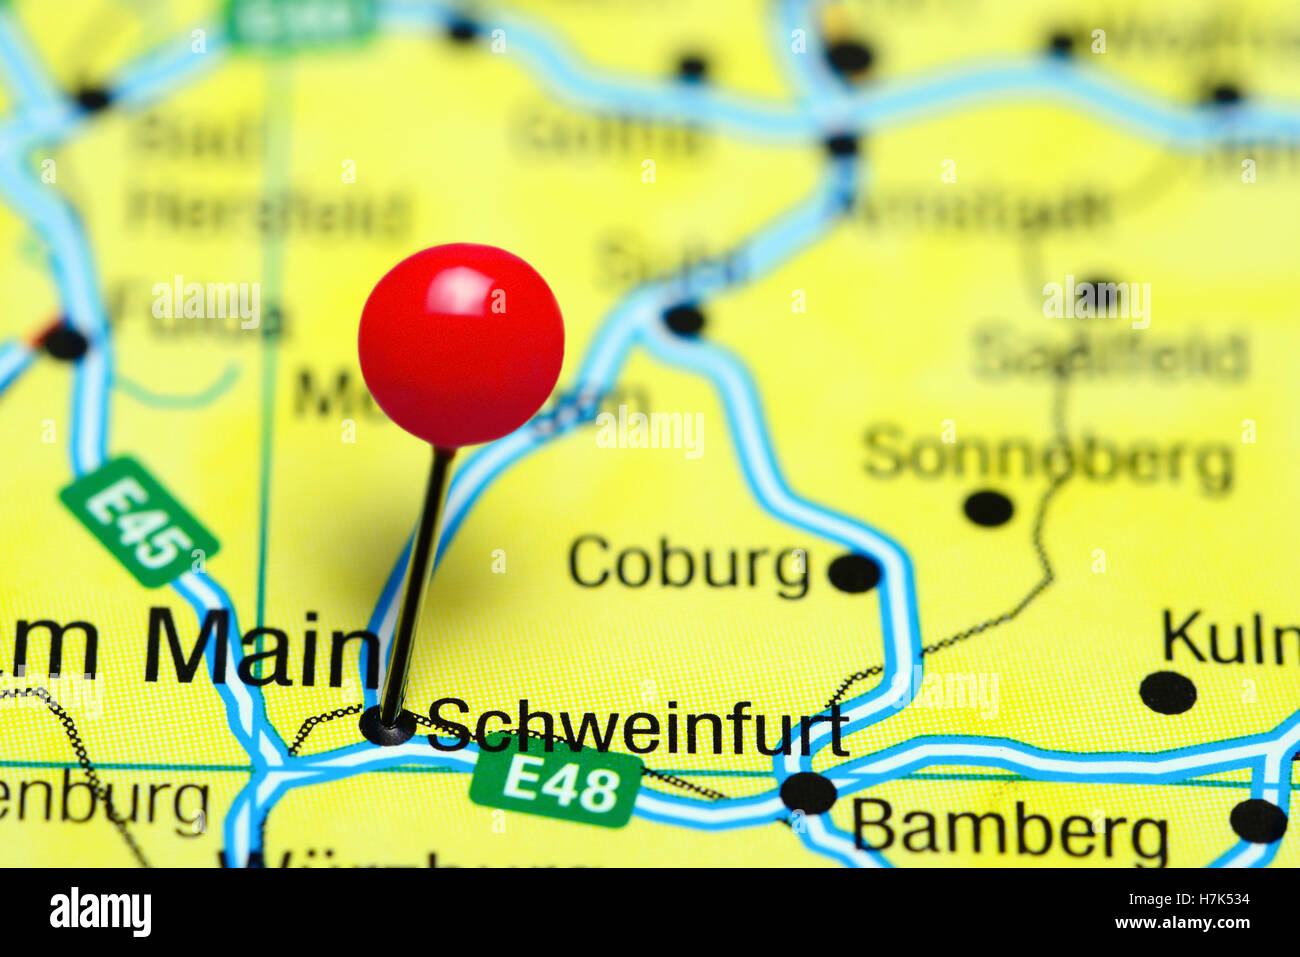 Schweinfurt Pinned On A Map Of Germany Stock Photo 125196264 Alamy